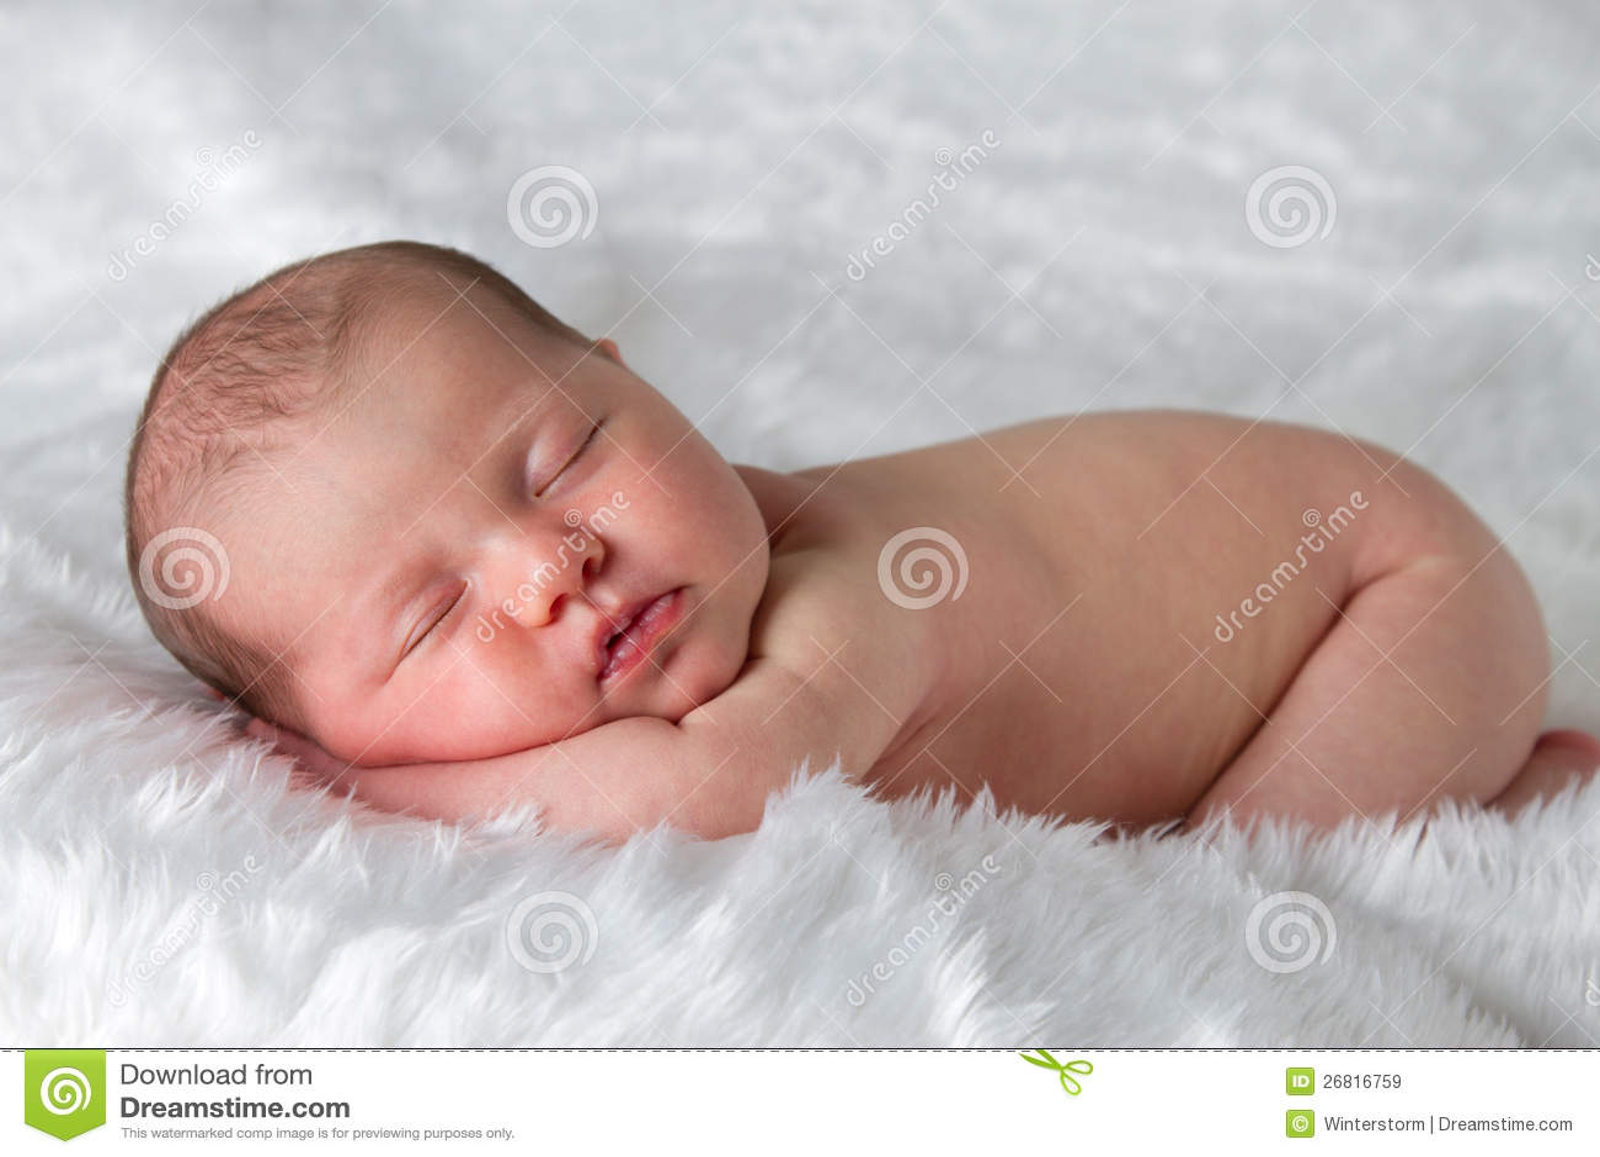 Newborn baby assessment (NIPE) – OSCE guide